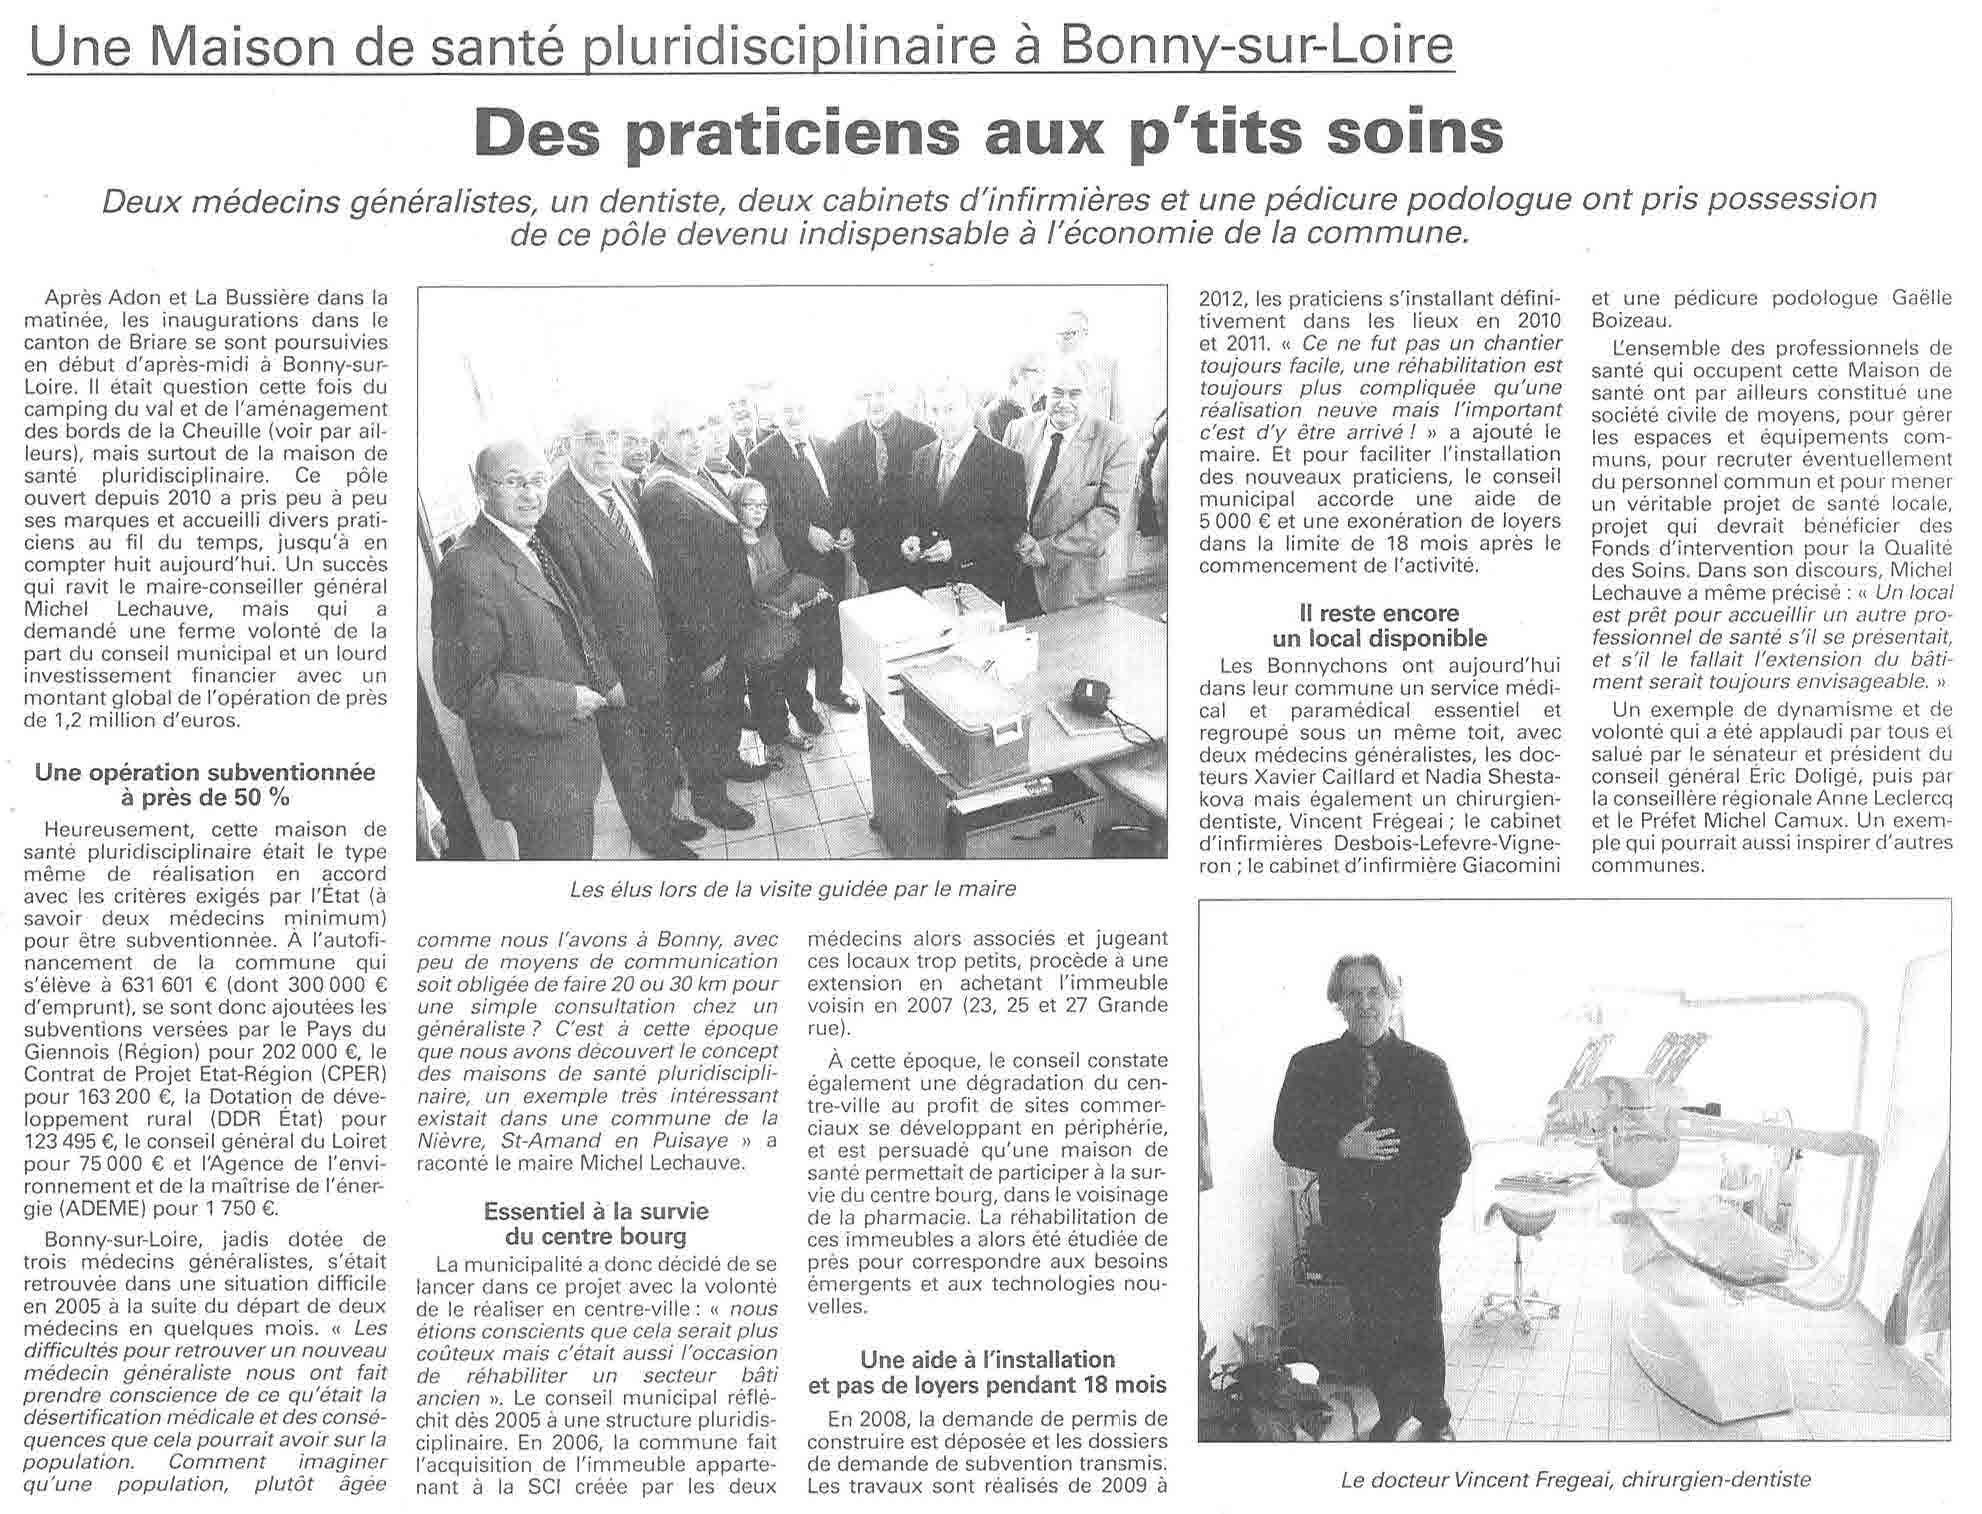 121004_JournalGien_Bonny_maison-sante